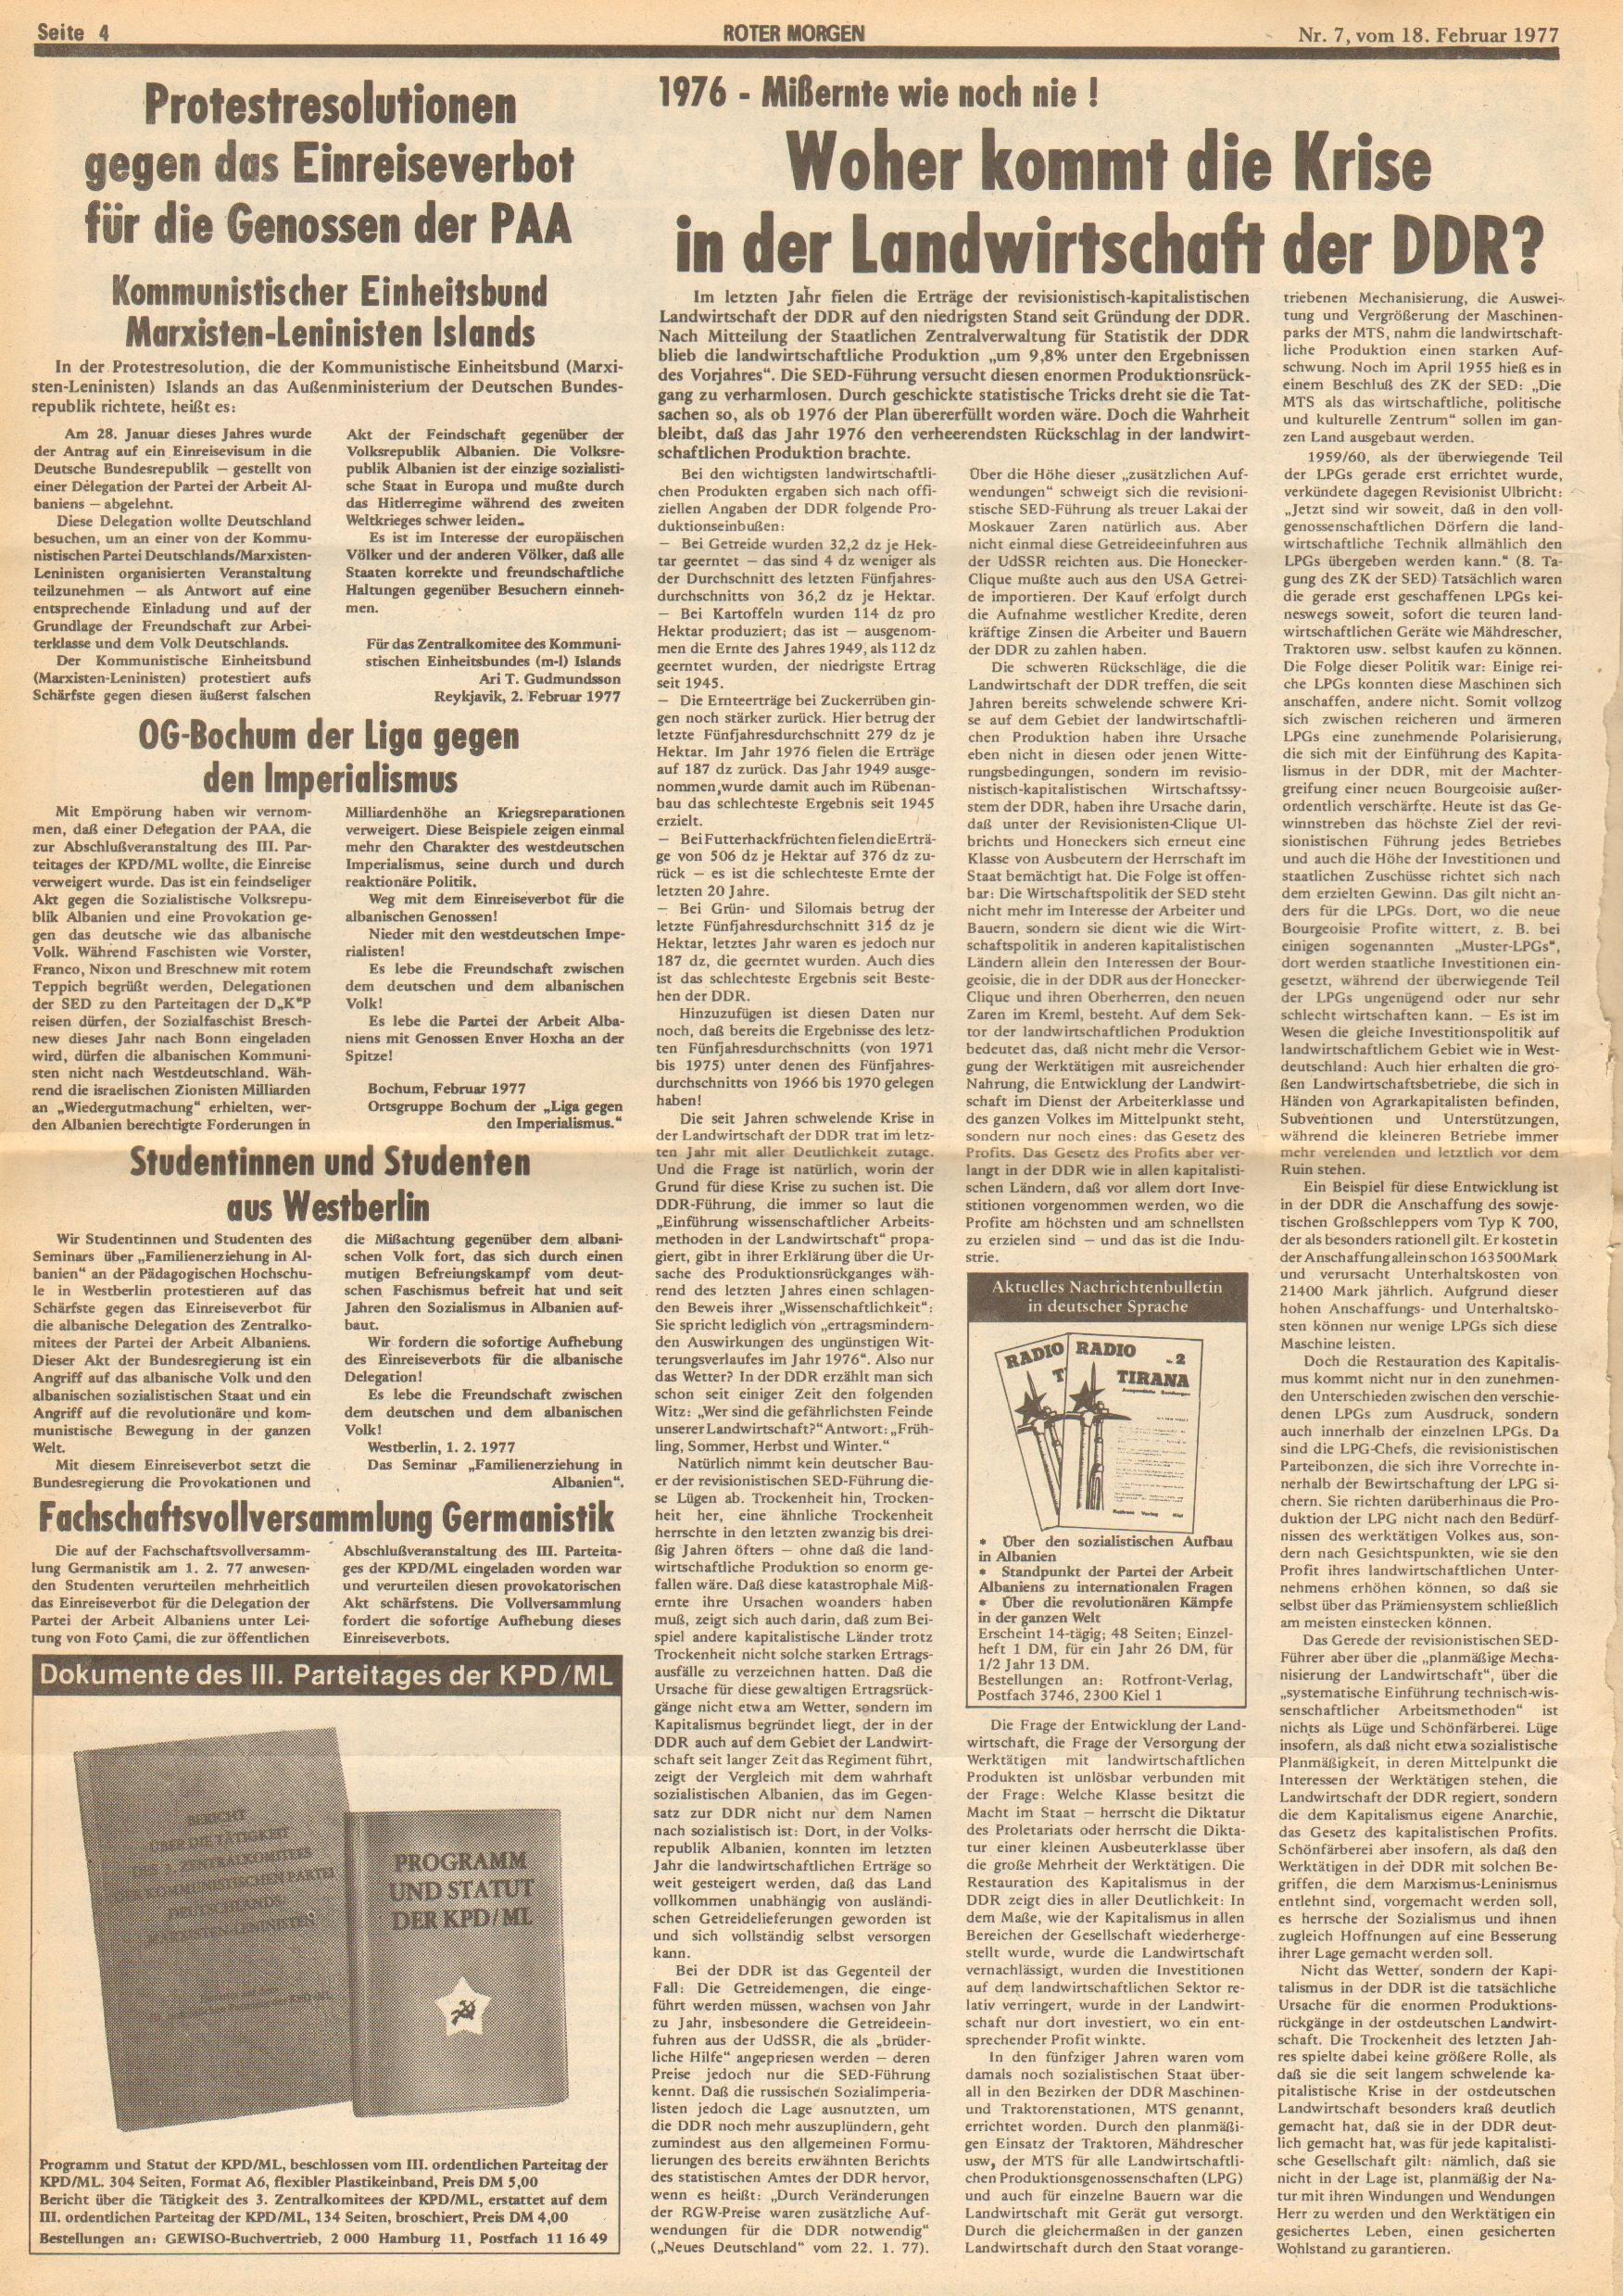 Roter Morgen, 11. Jg., 18. Februar 1977, Nr. 7, Seite 4